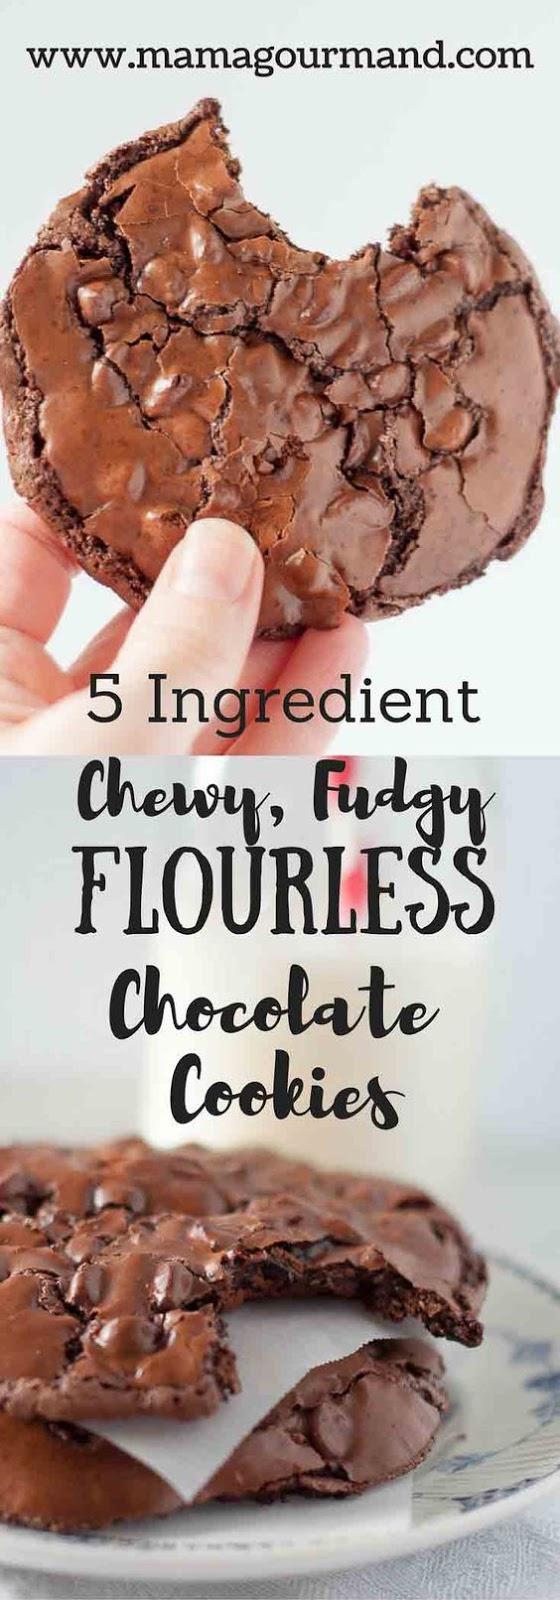 Chewy, Fudgy Flourless Chocolate Cookies